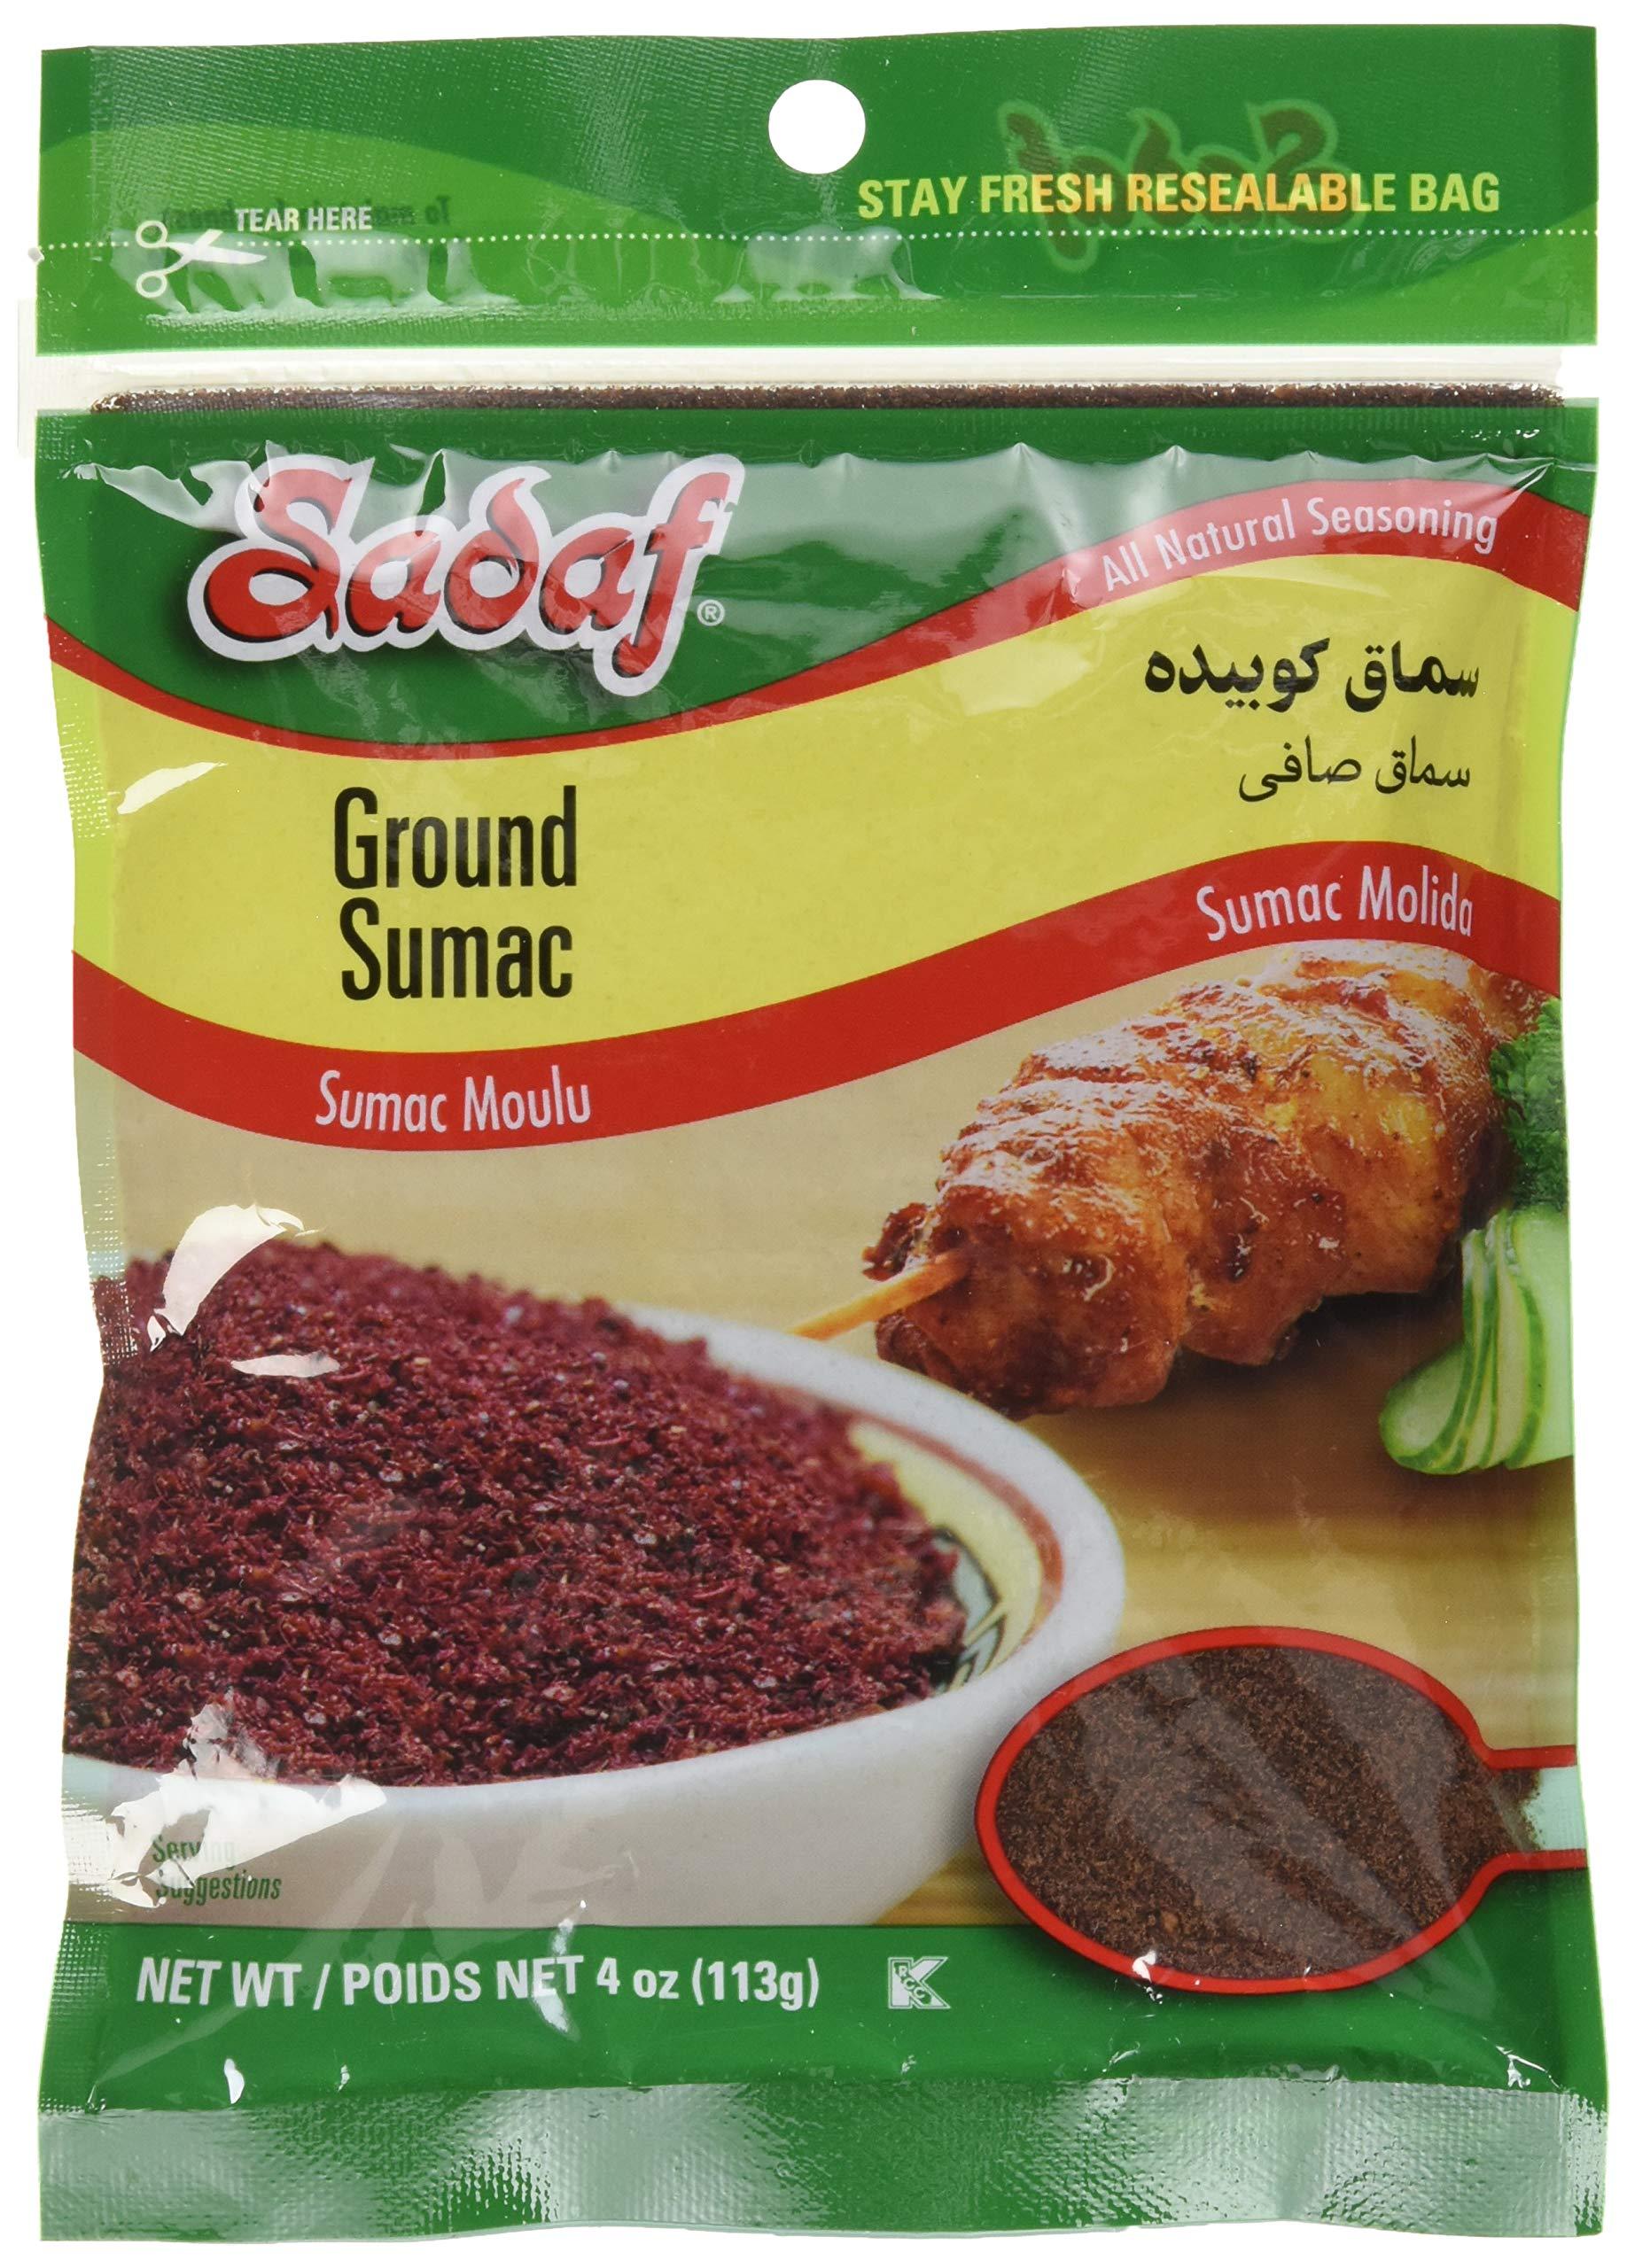 Sadaf Ground Sumac - 4oz (Pack of 2)